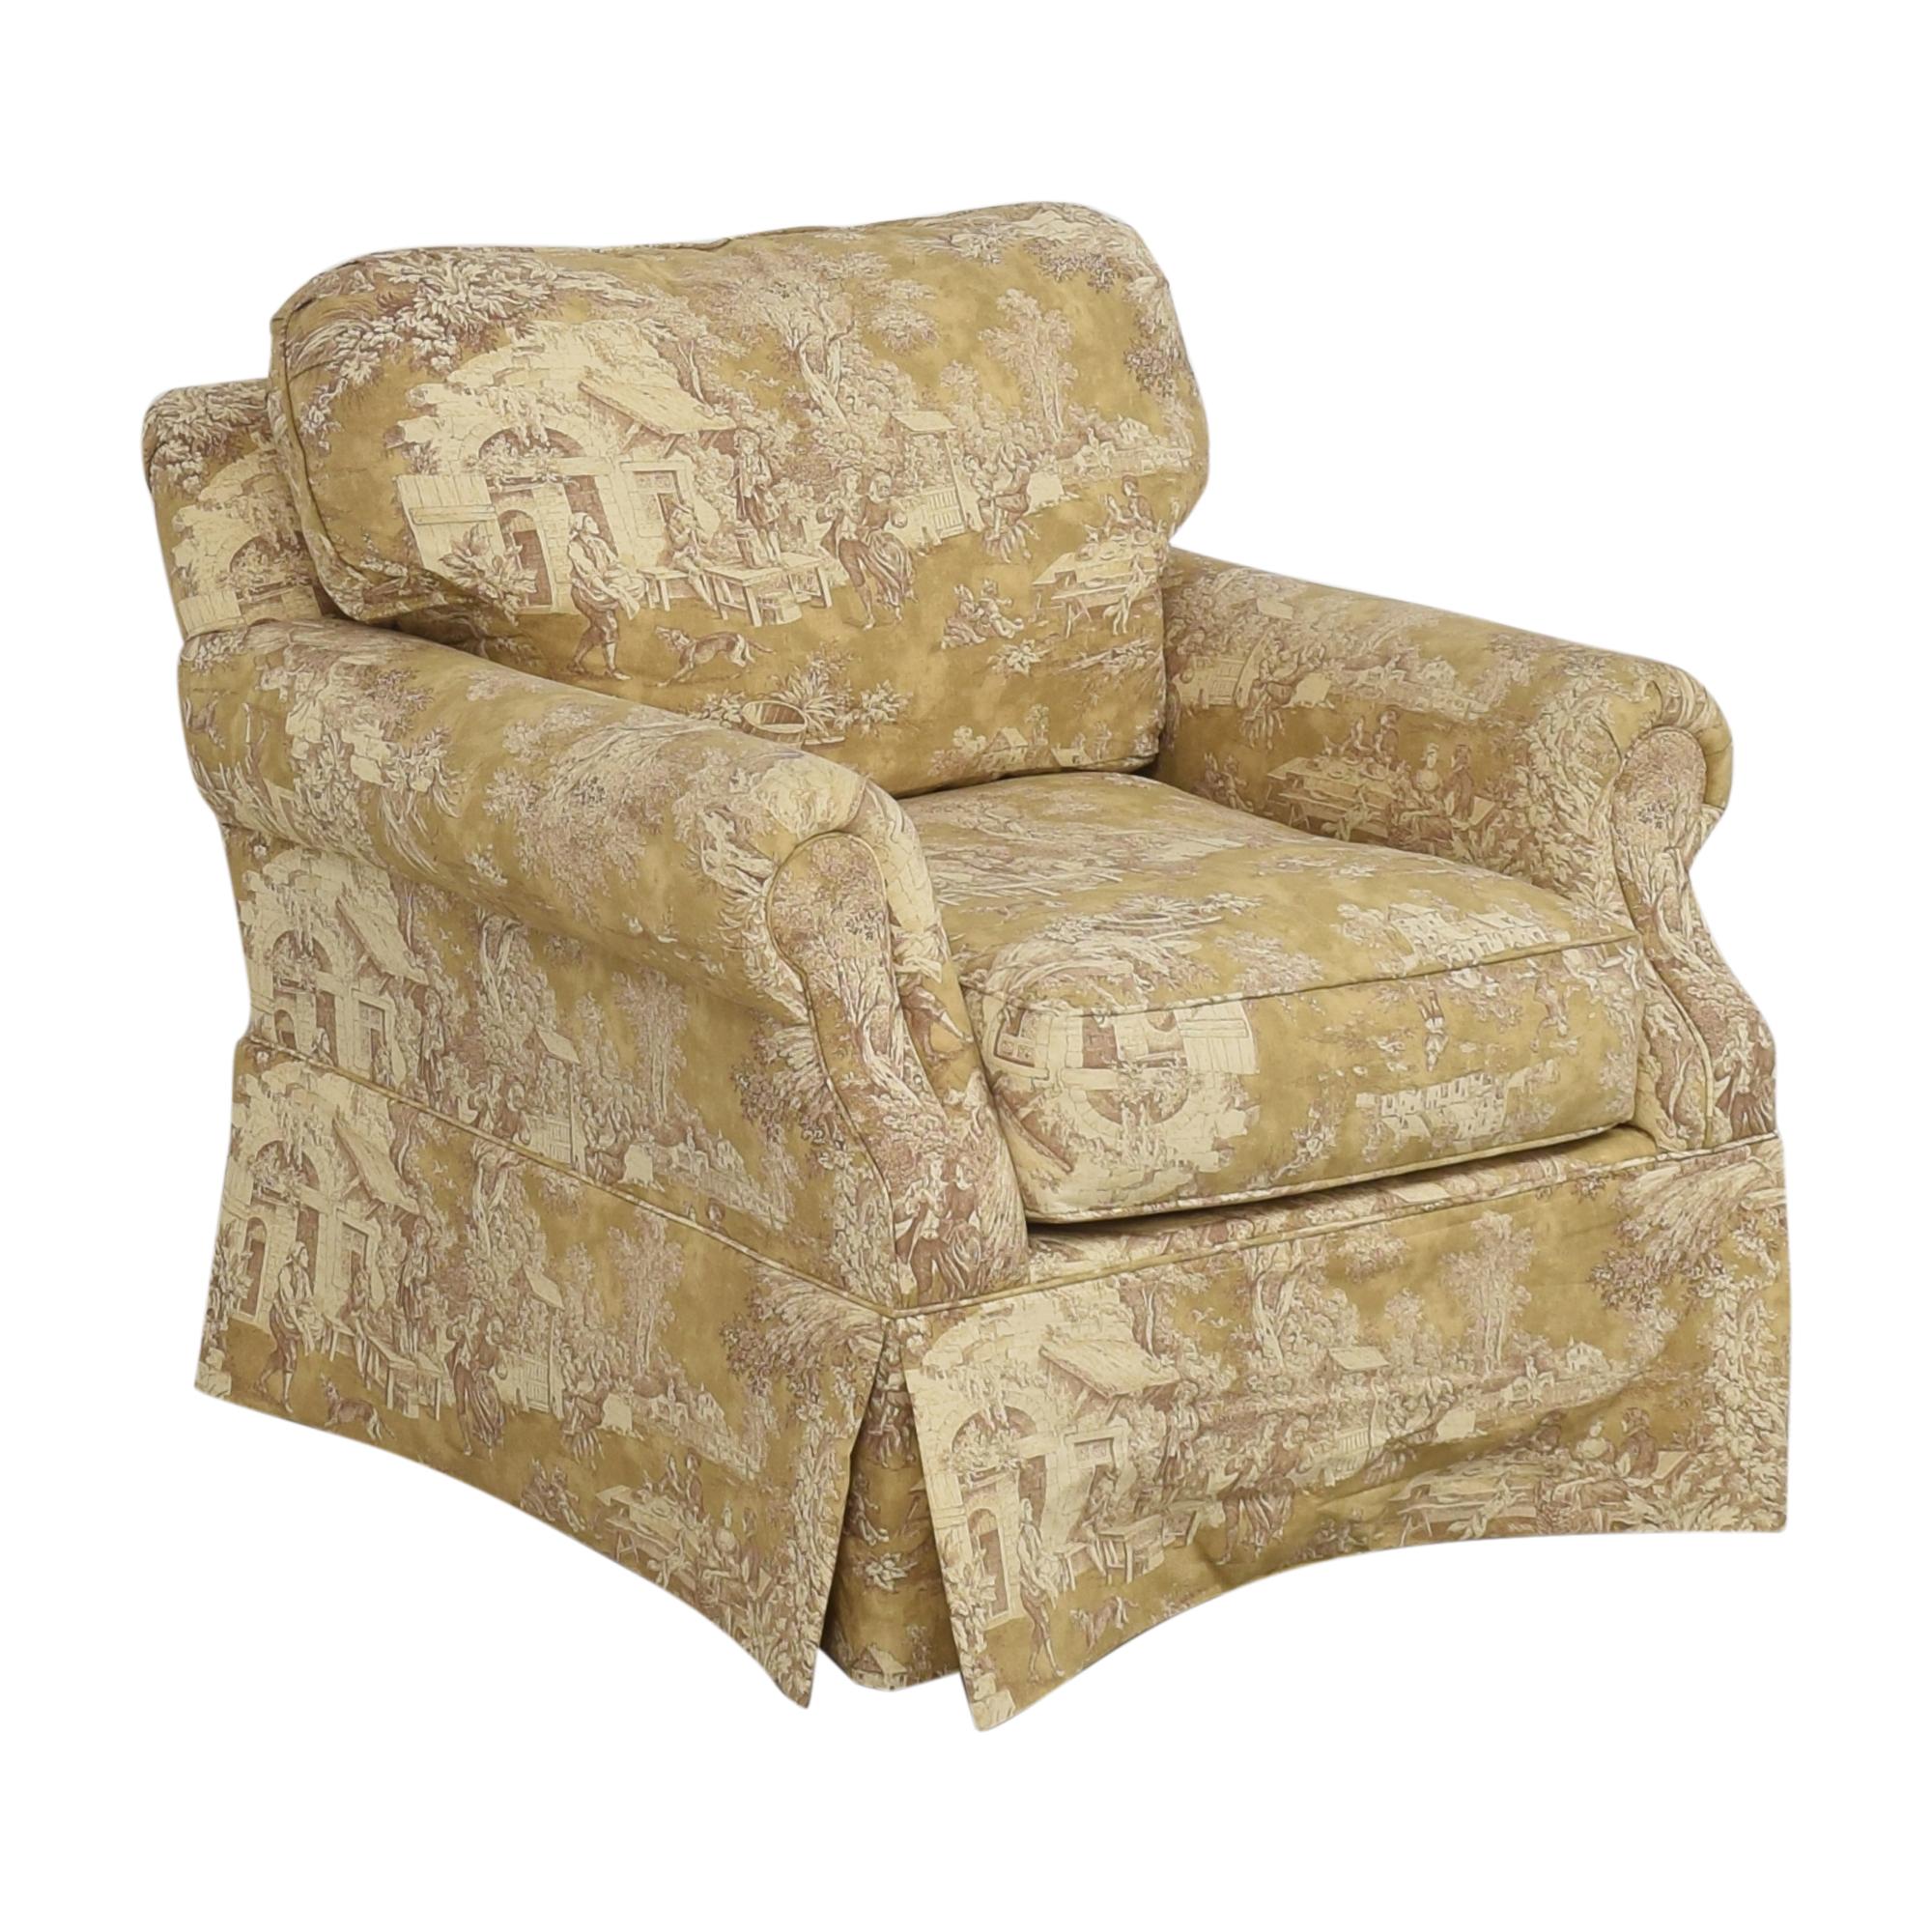 Domain Home Domain Home Toile Club Chair for sale